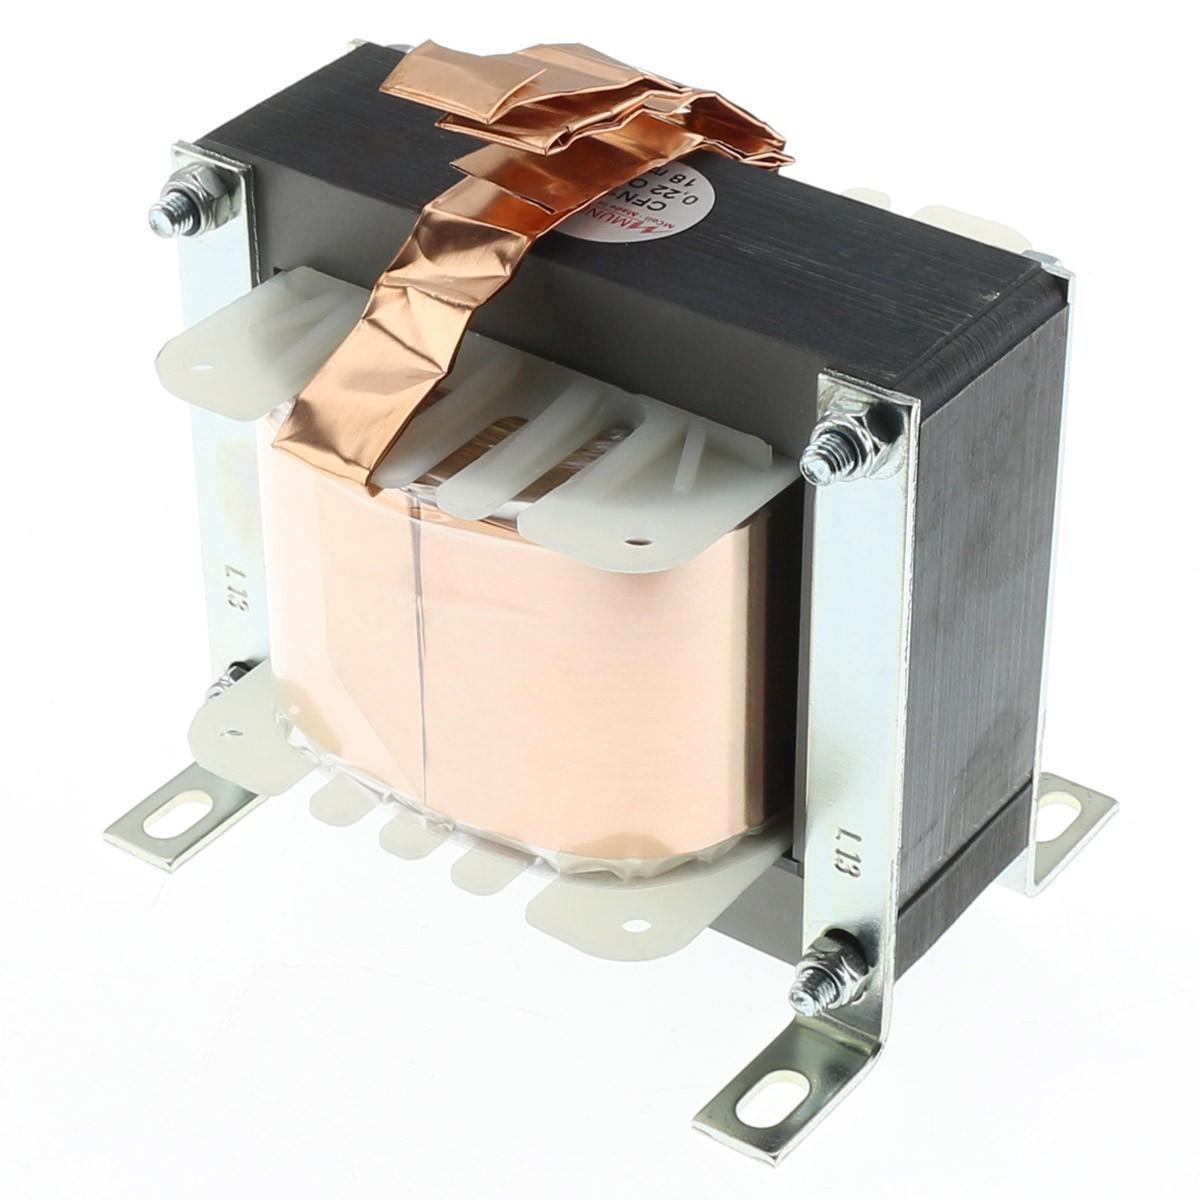 MUNDORF MCOIL CFN12 Copper Coil 10mH